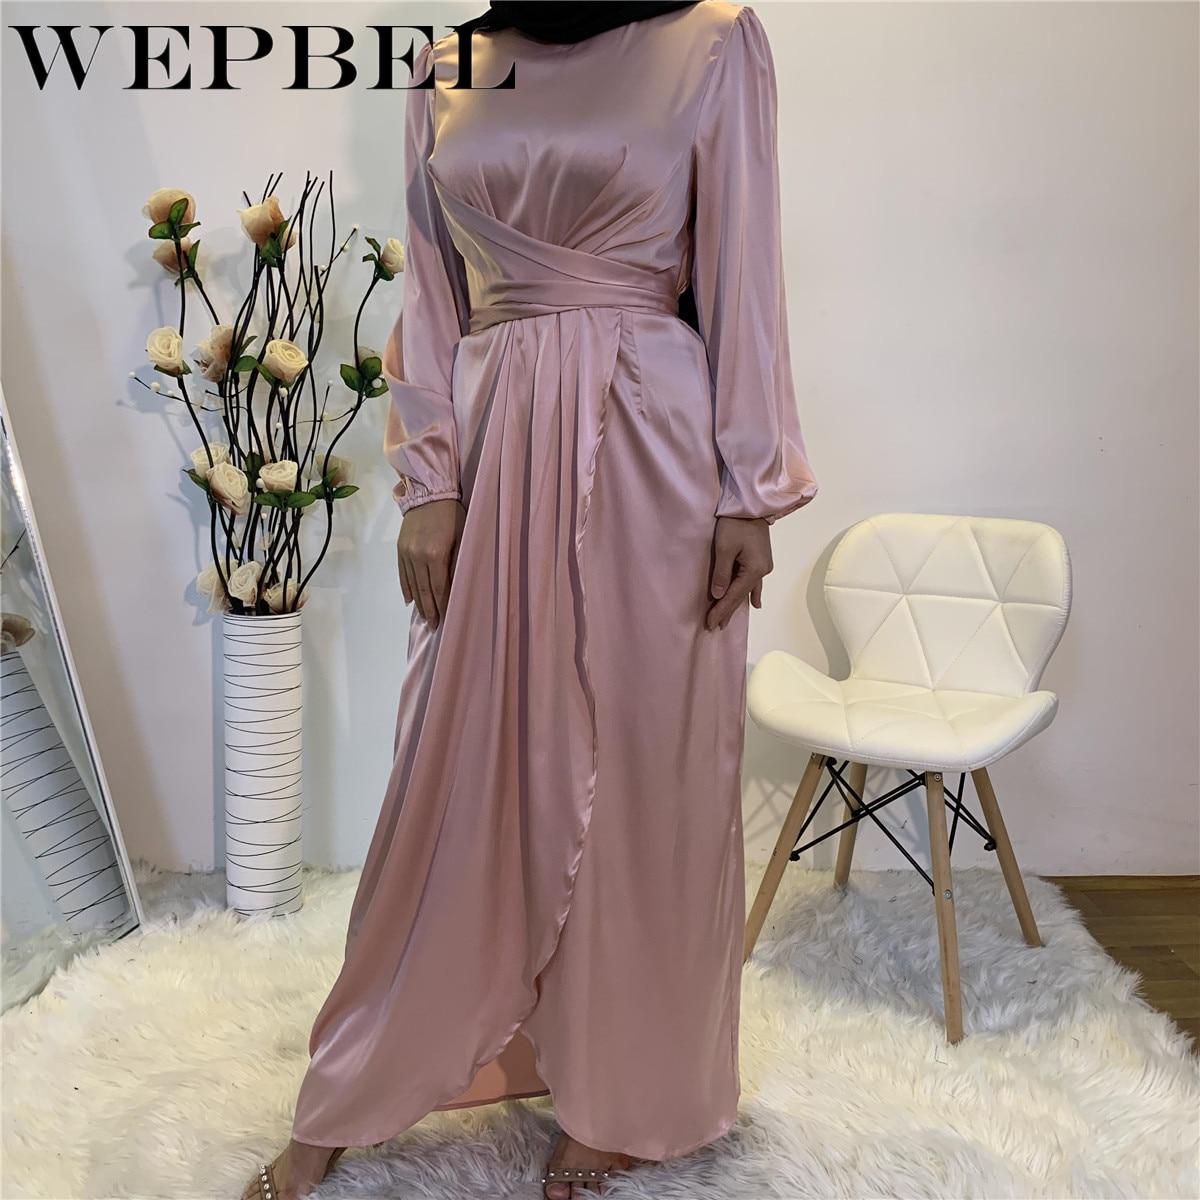 WEPBEL Fake Two Pieces Long Sleeve Party Maxi Dress Women's Fashion Islamic Muslim Kaftan